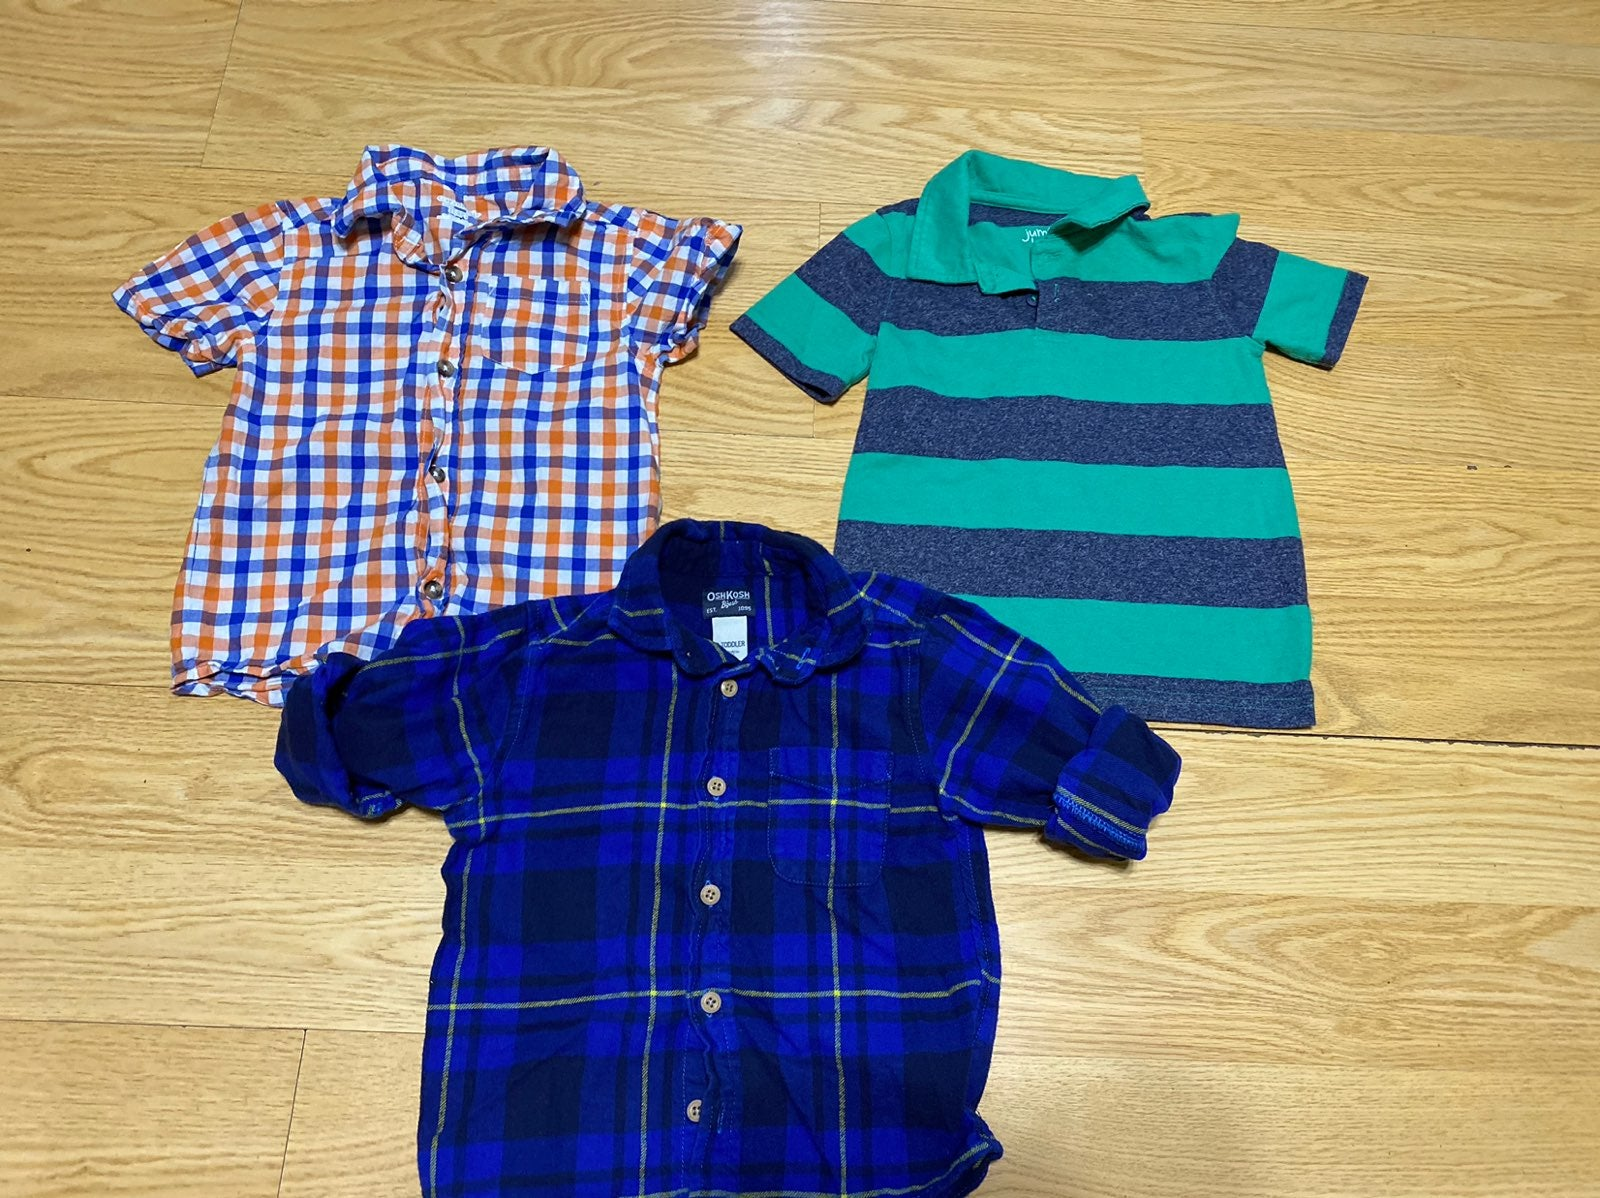 3T shirts